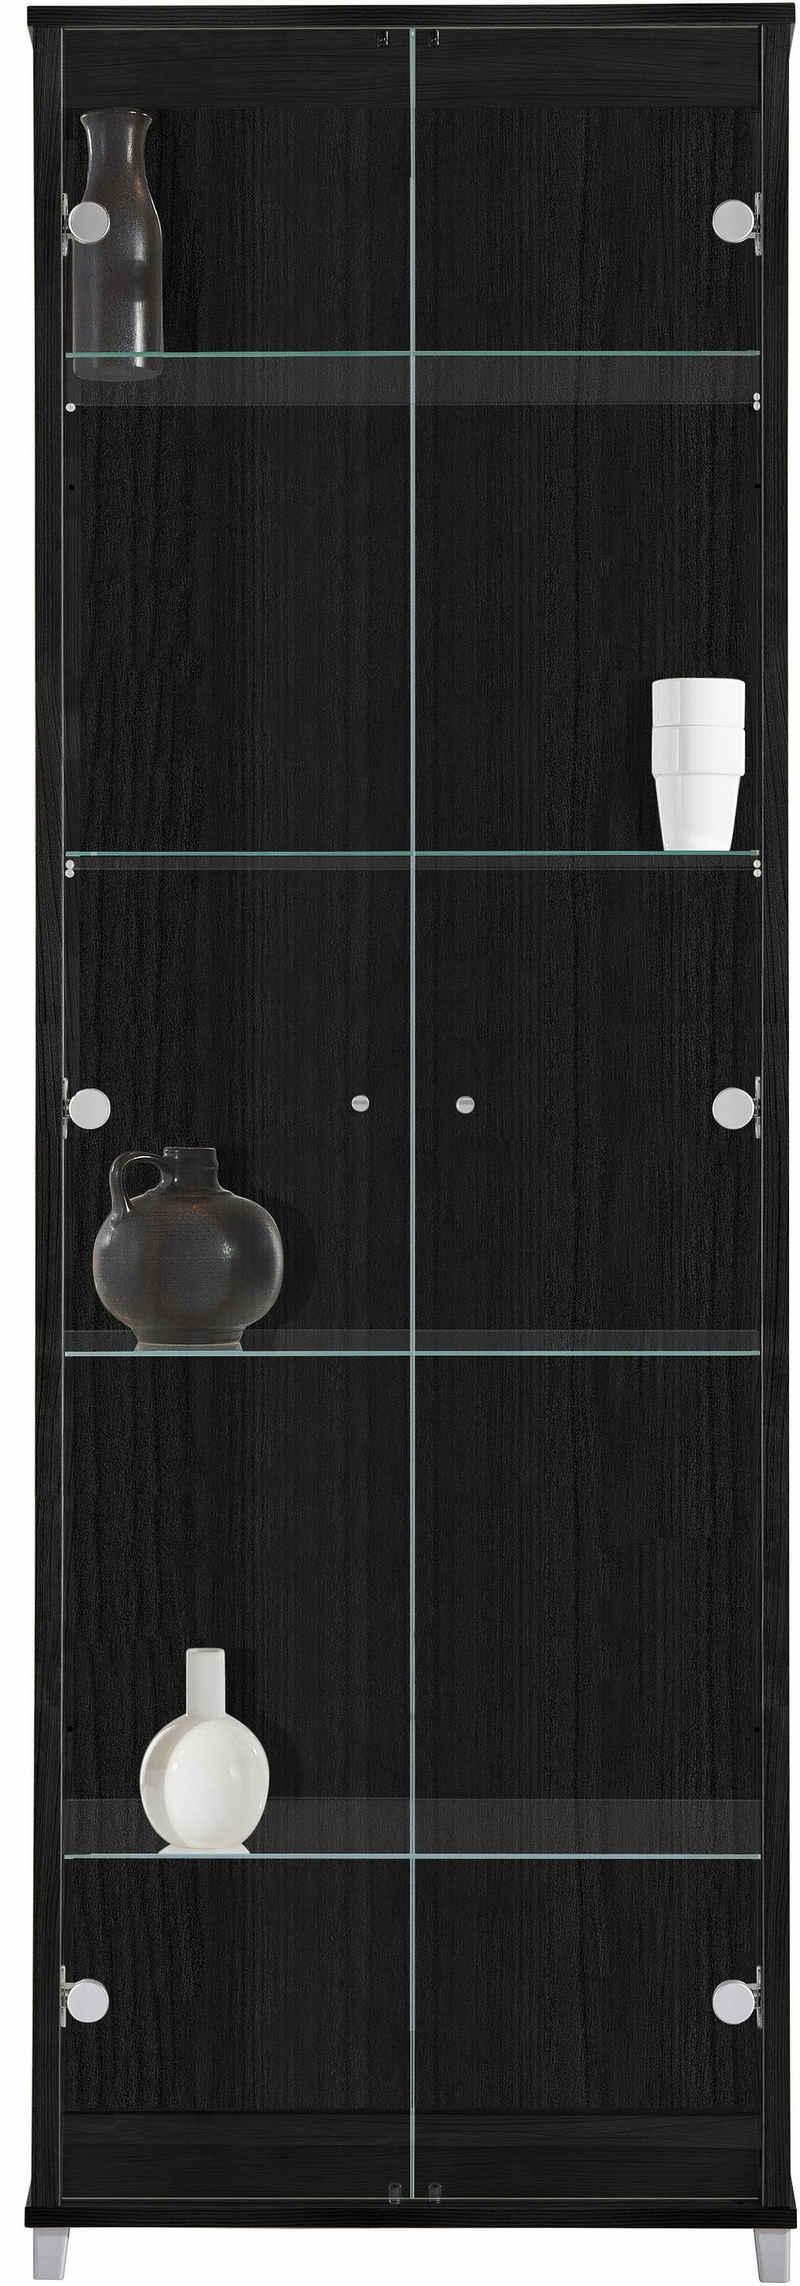 fif möbel Vitrine 2-türig, 4 Glasböden